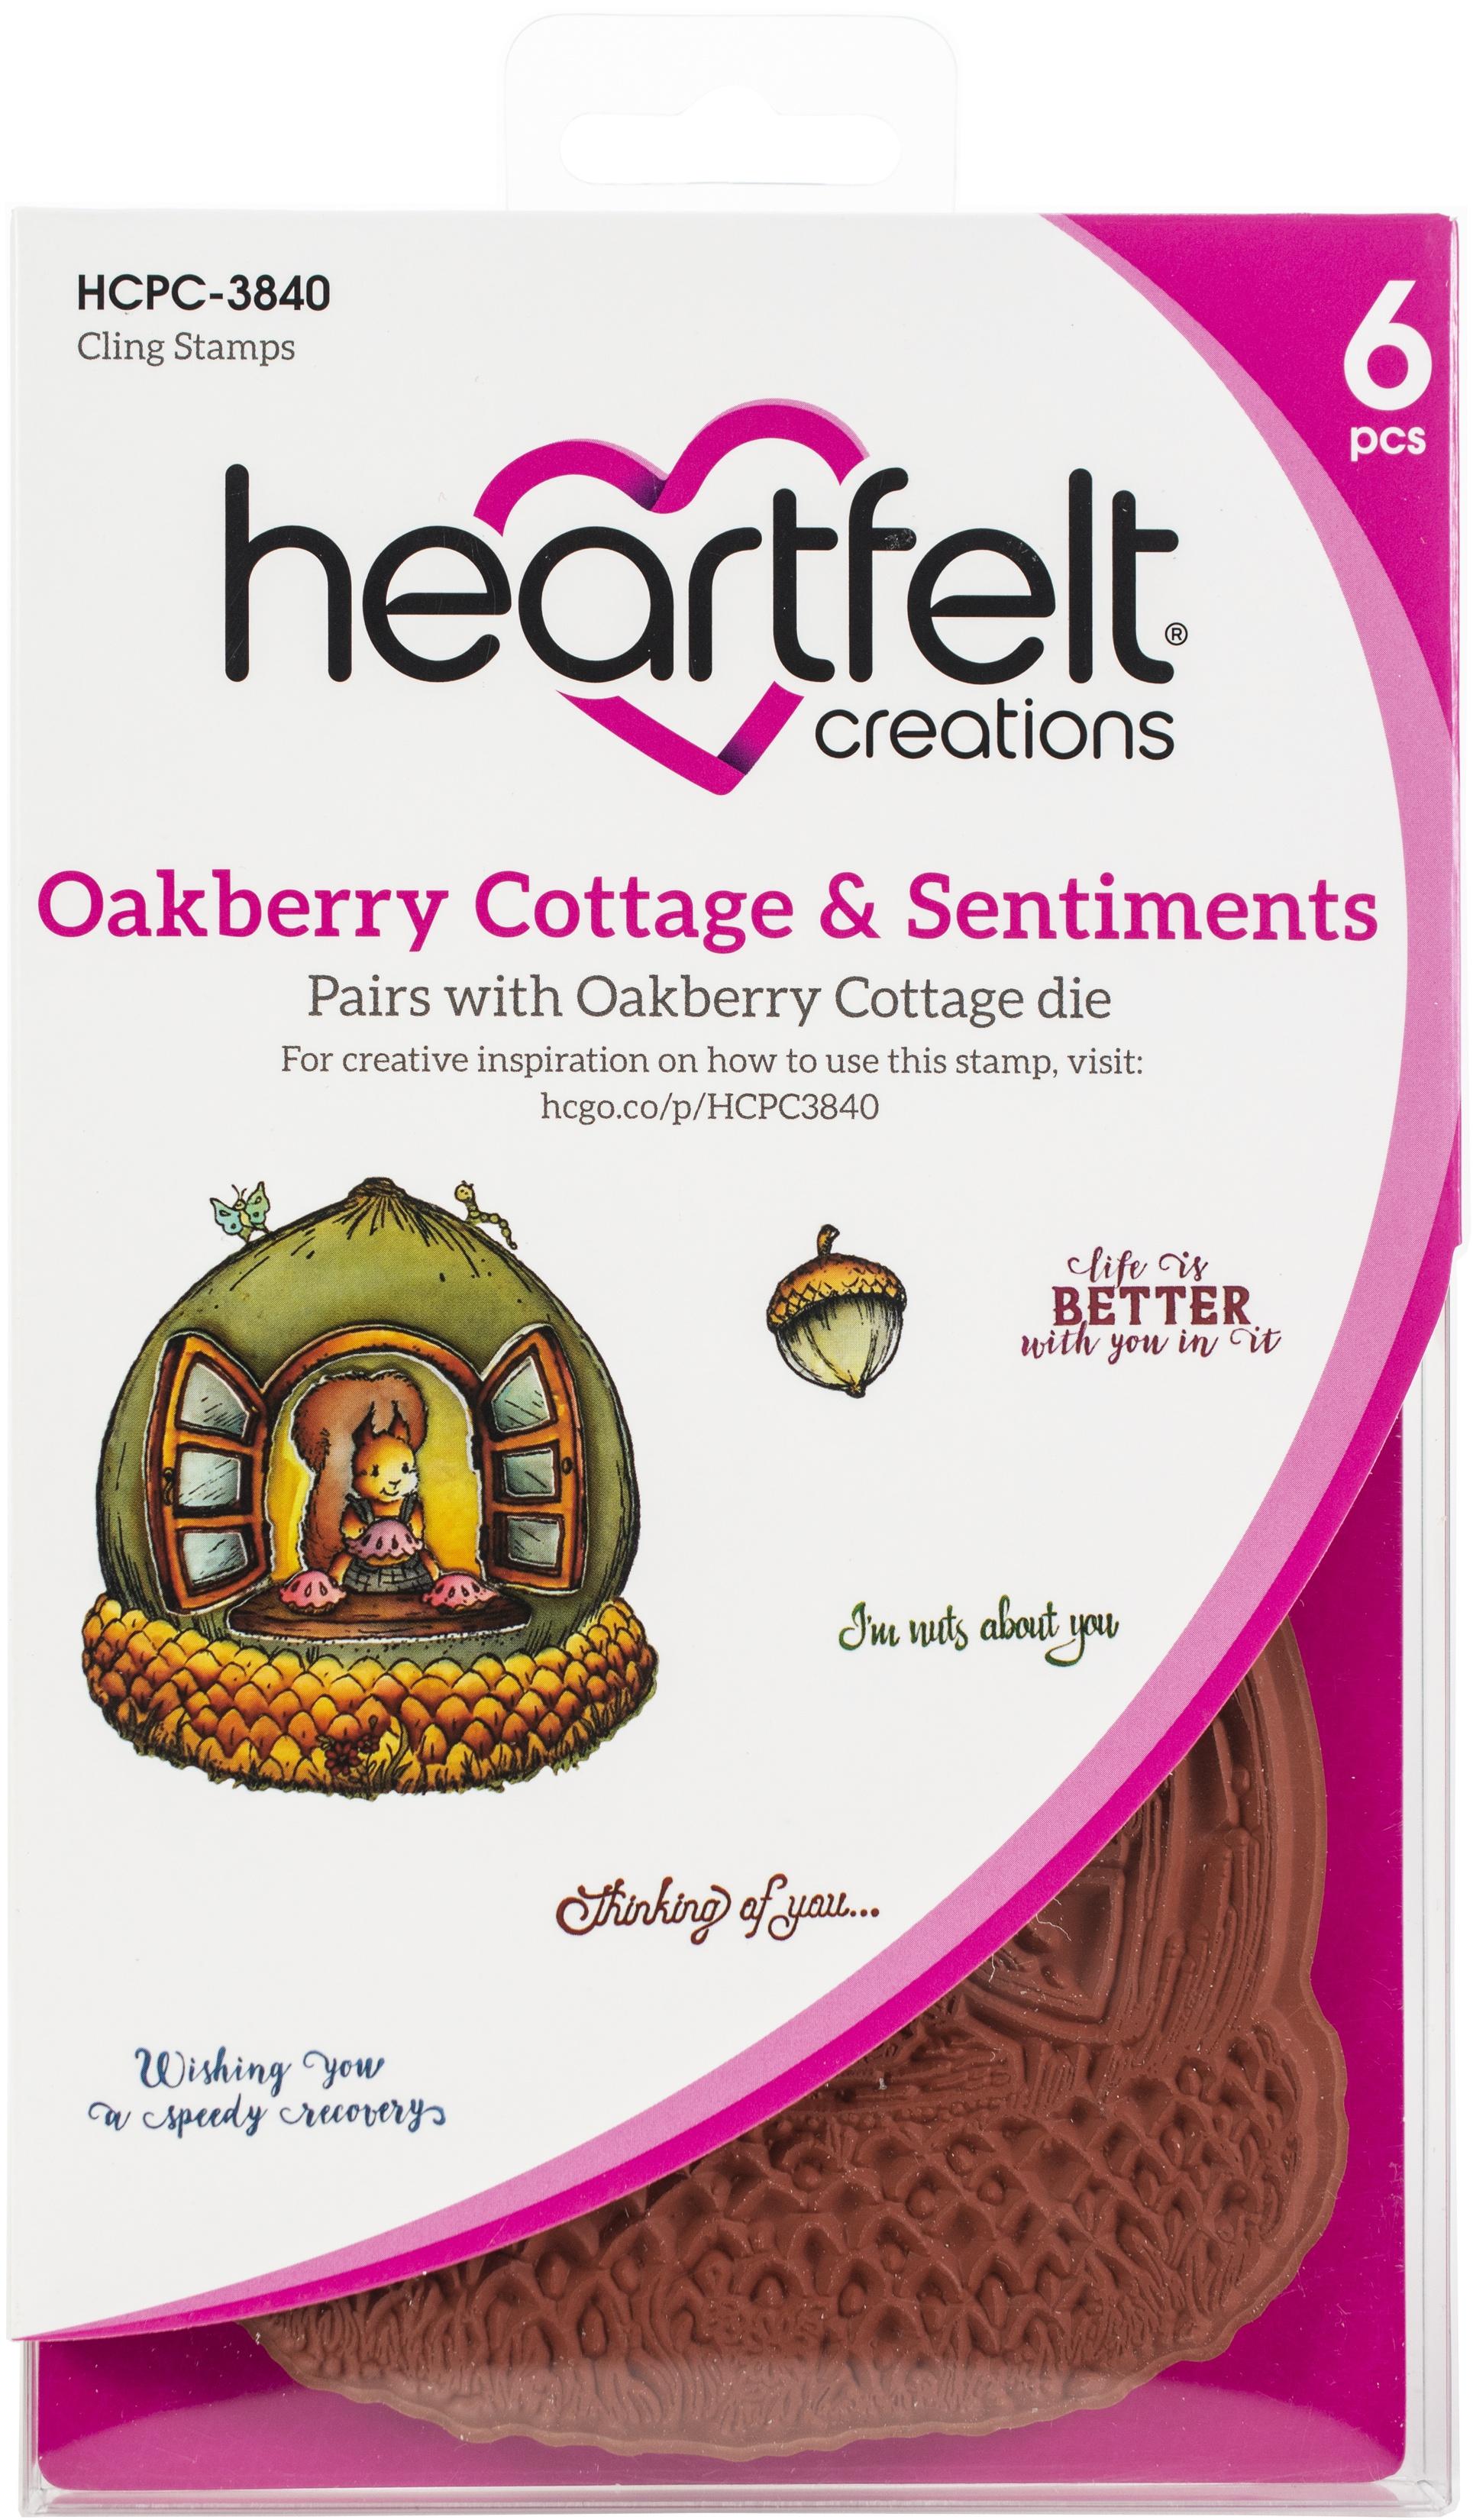 Oakberry Cottage & Sentiments